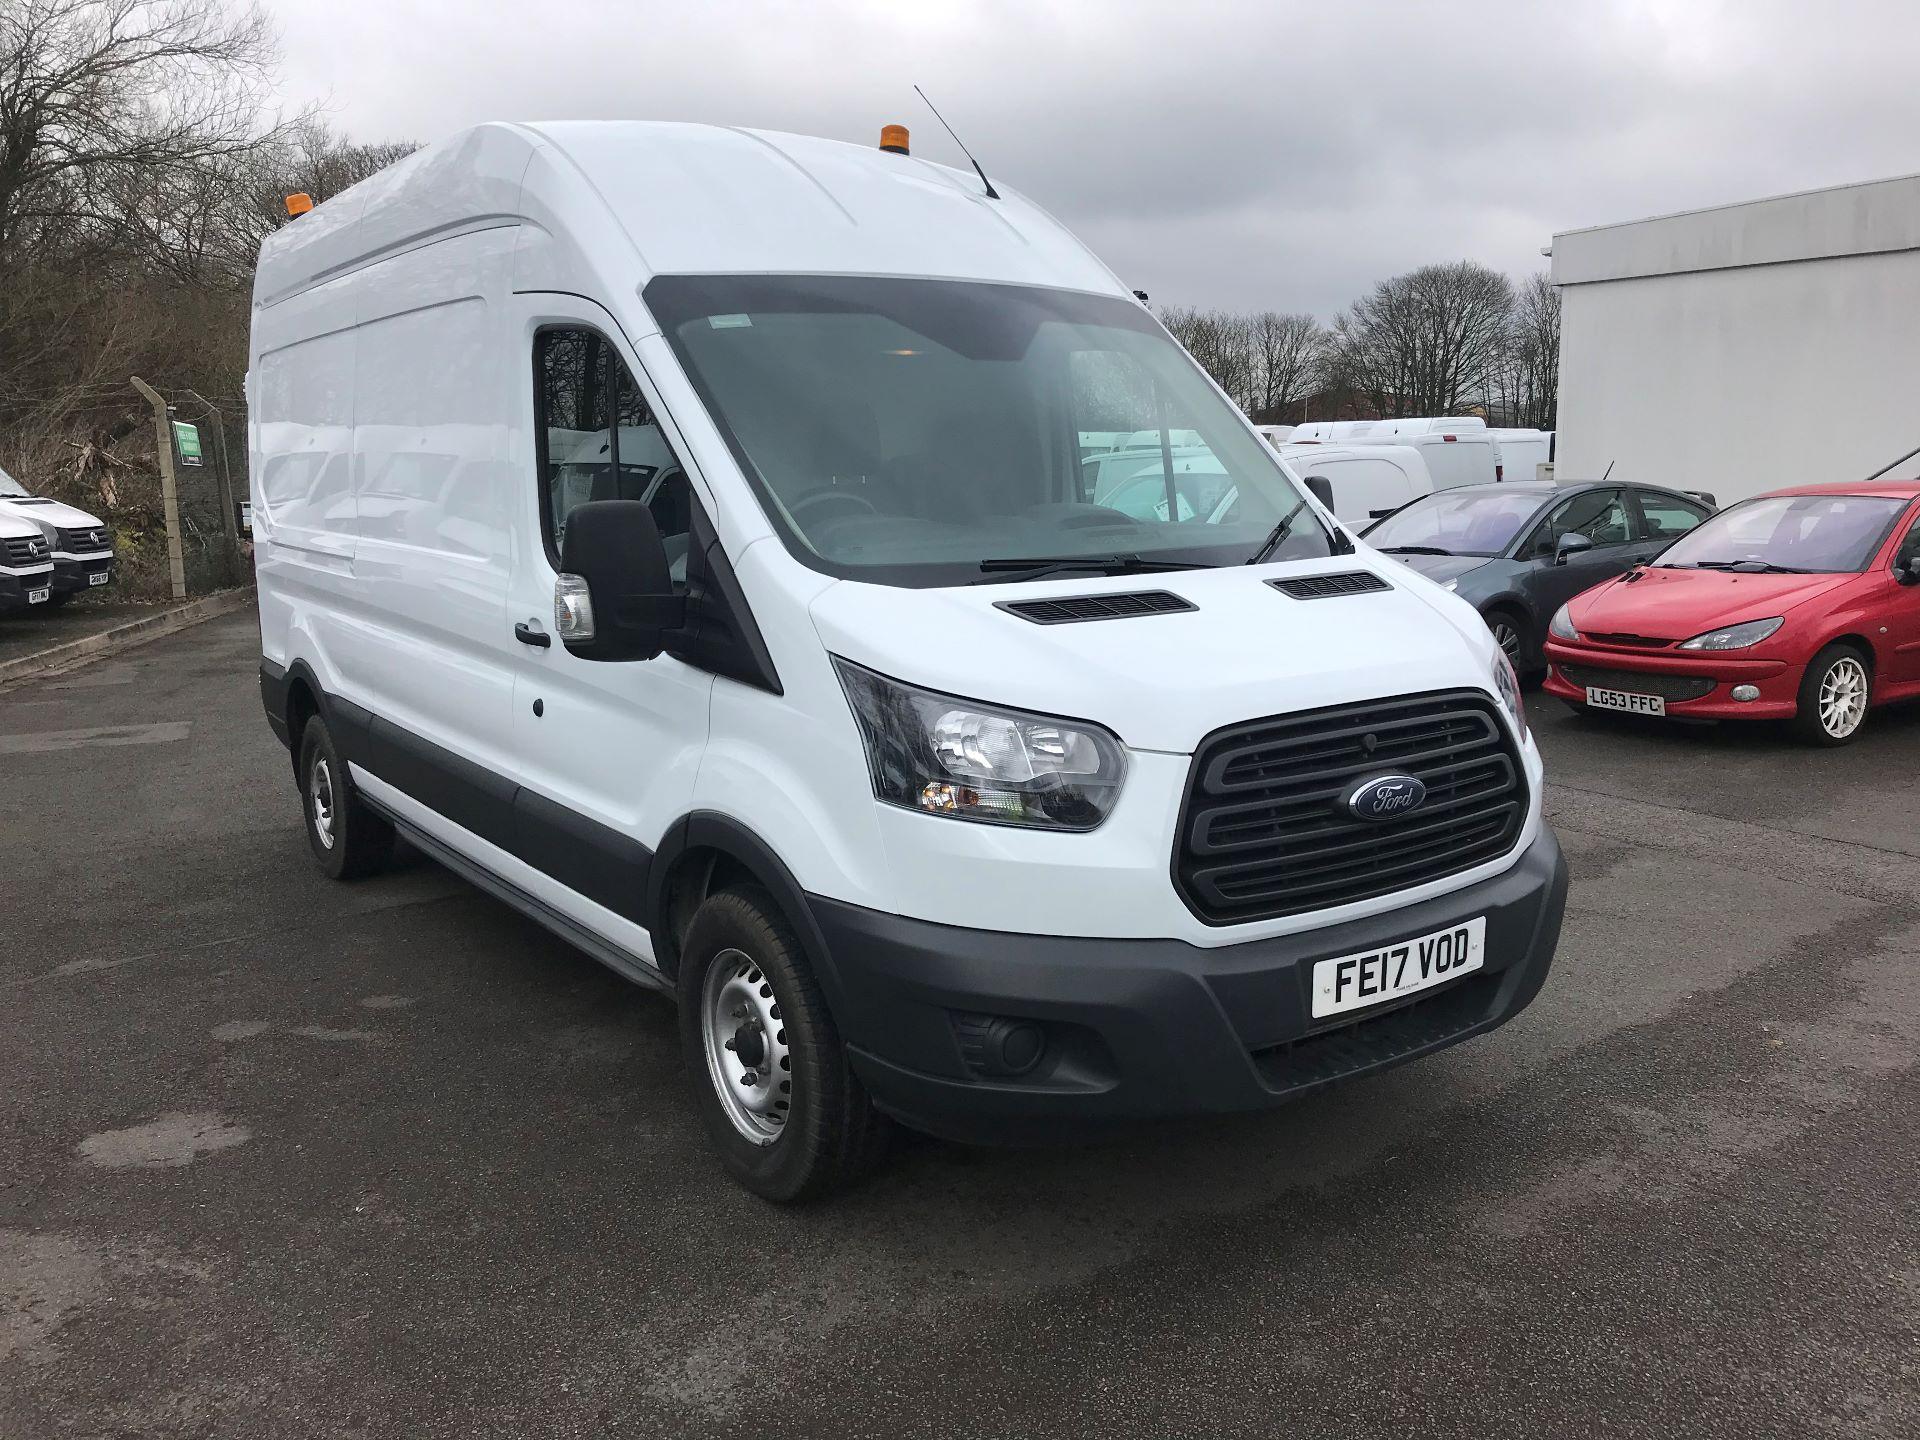 2017 Ford Transit L3 H3 VAN 130PS EURO 6 (FE17VOD)